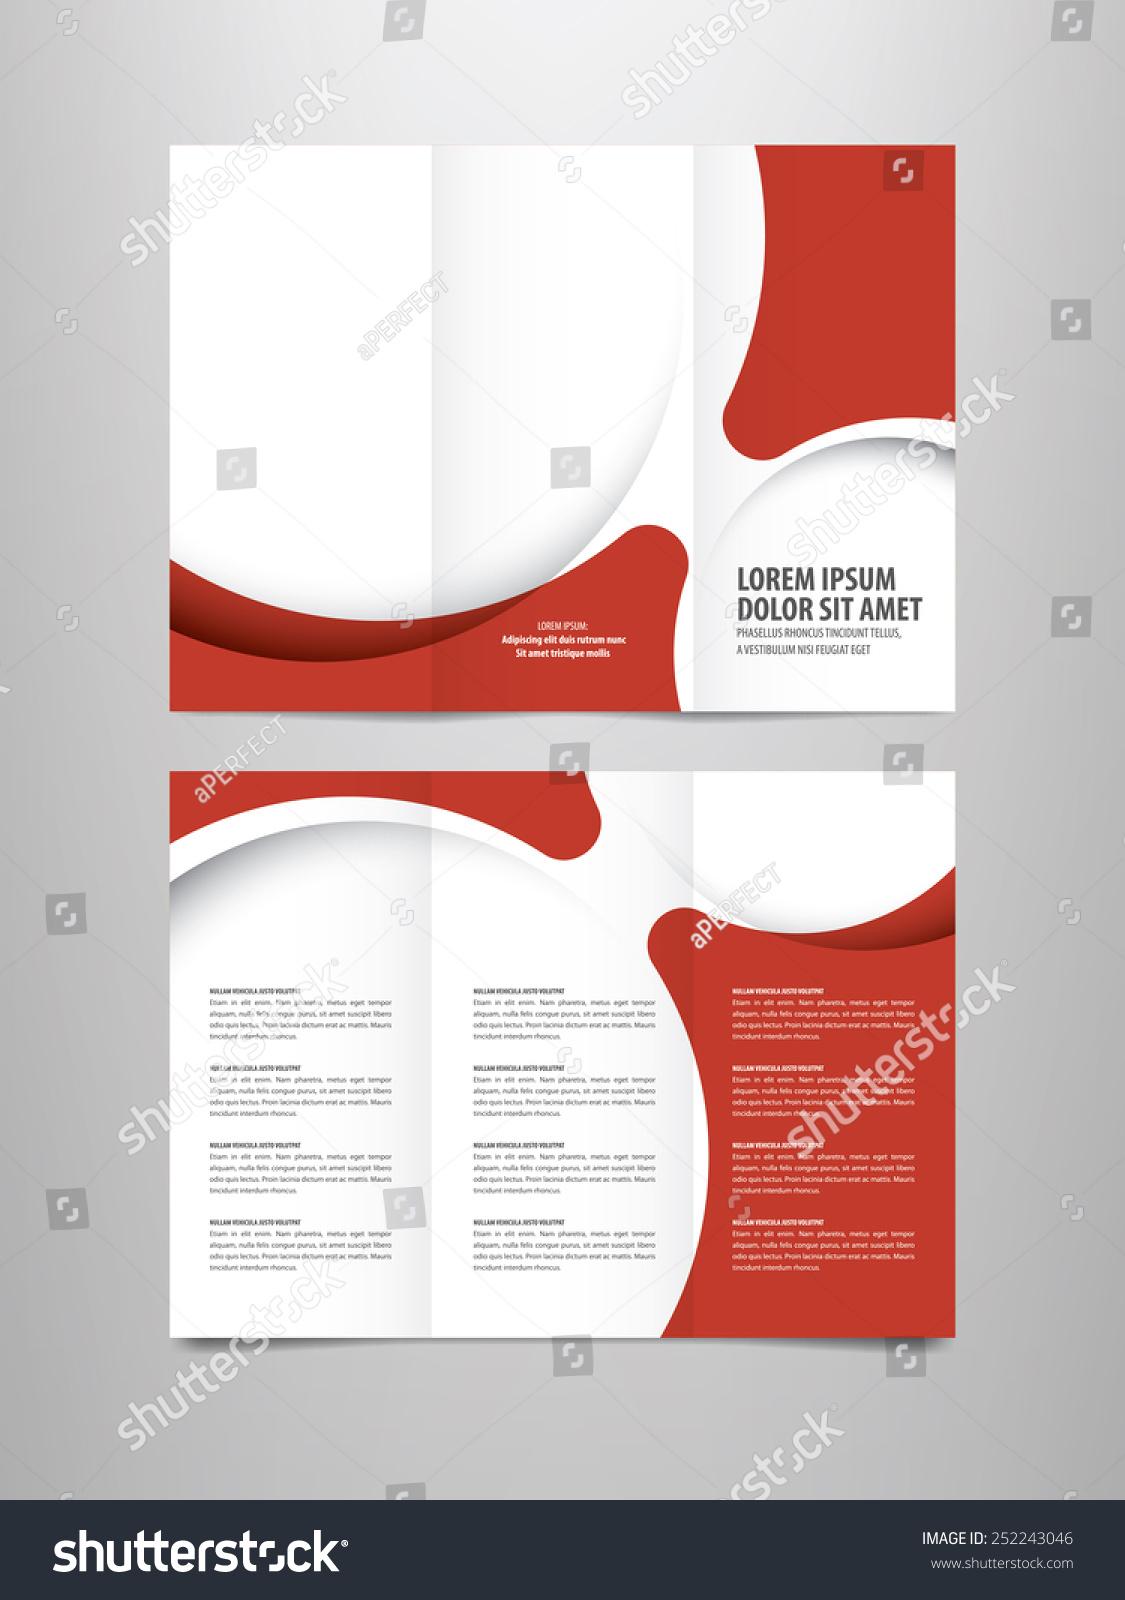 Tri fold business brochure template ez canvas id 252243046 fbccfo Choice Image